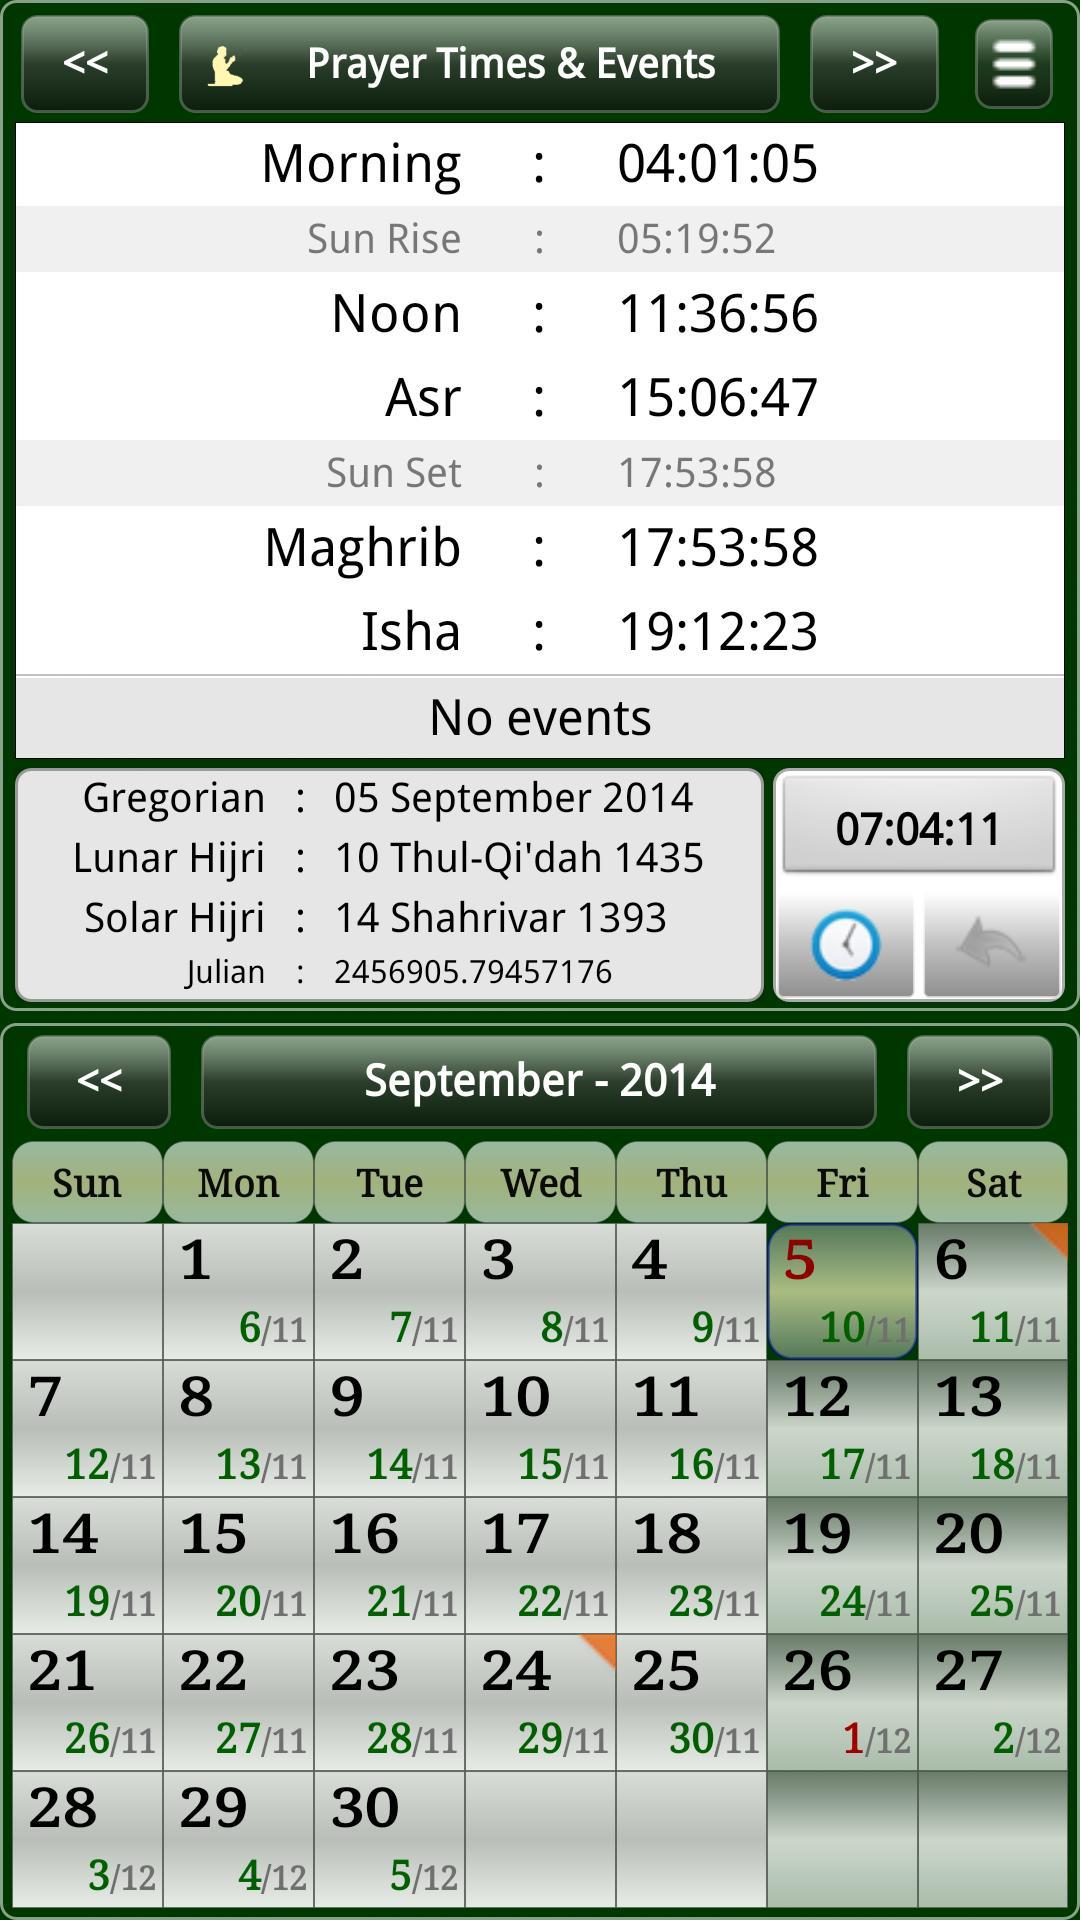 Sun & Moon Calendar Для Андроид  Скачать Apk in Isha Lunar Calendar